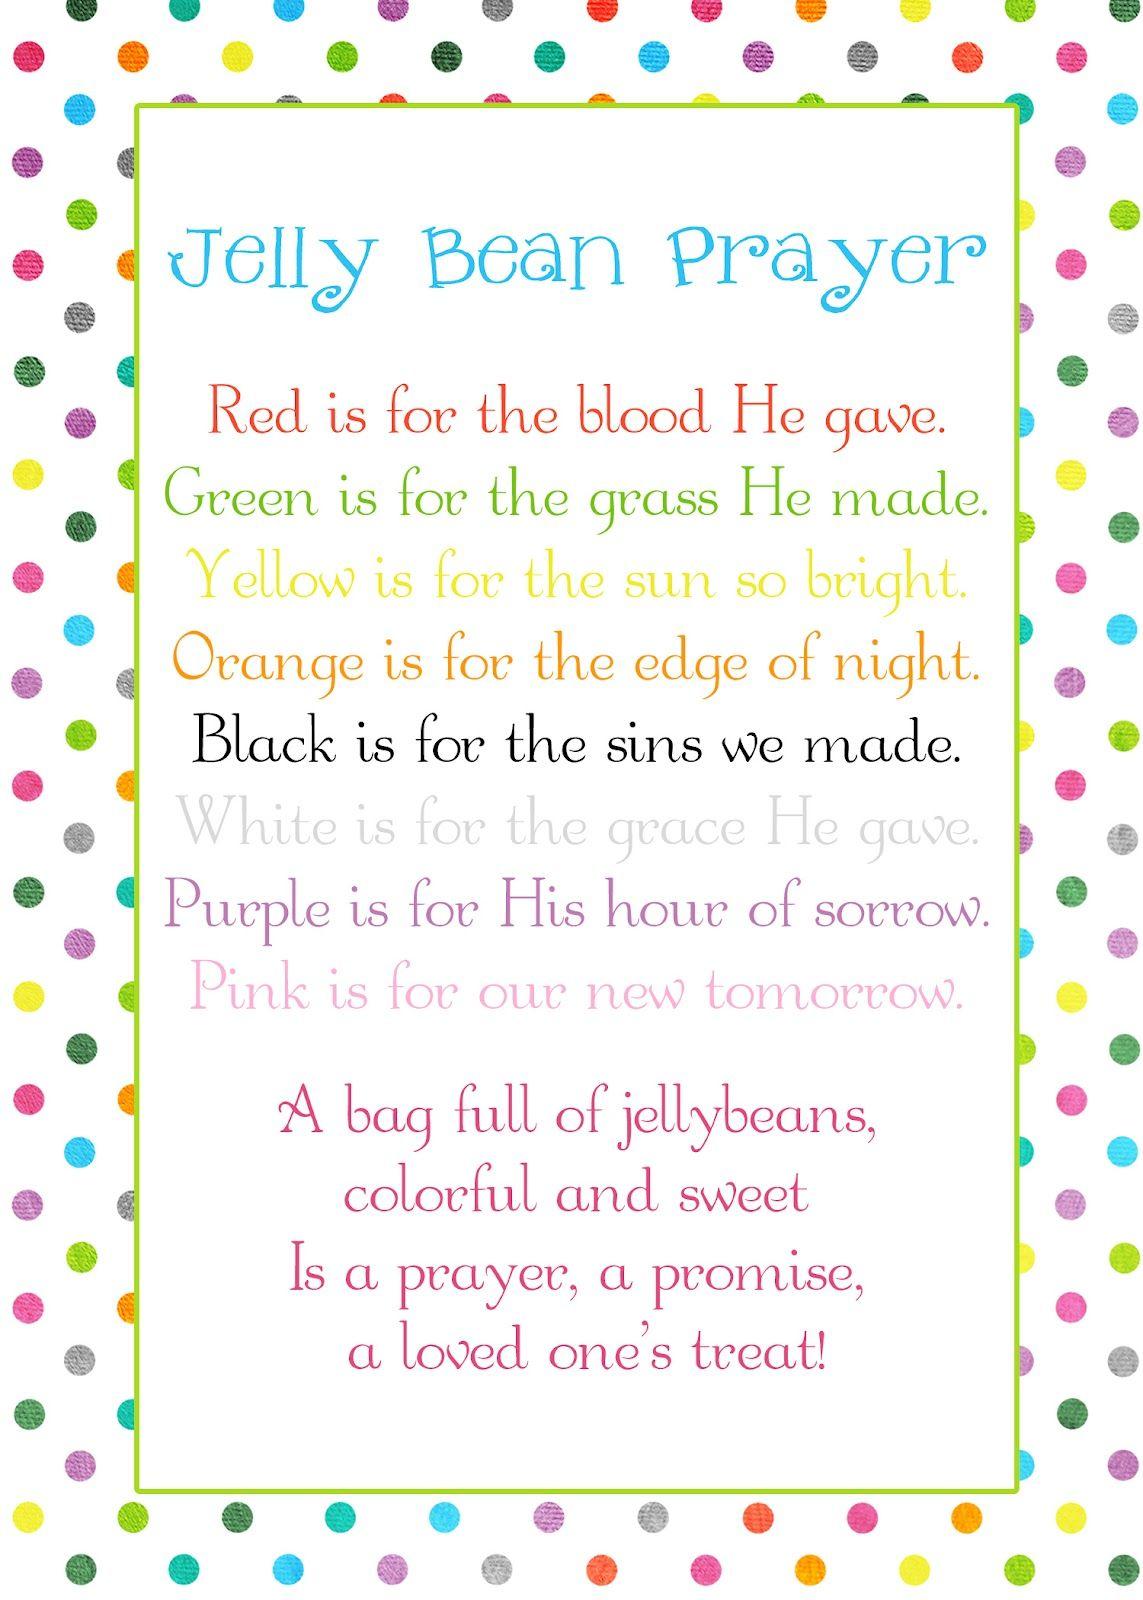 Jelly Bean Prayer Poem